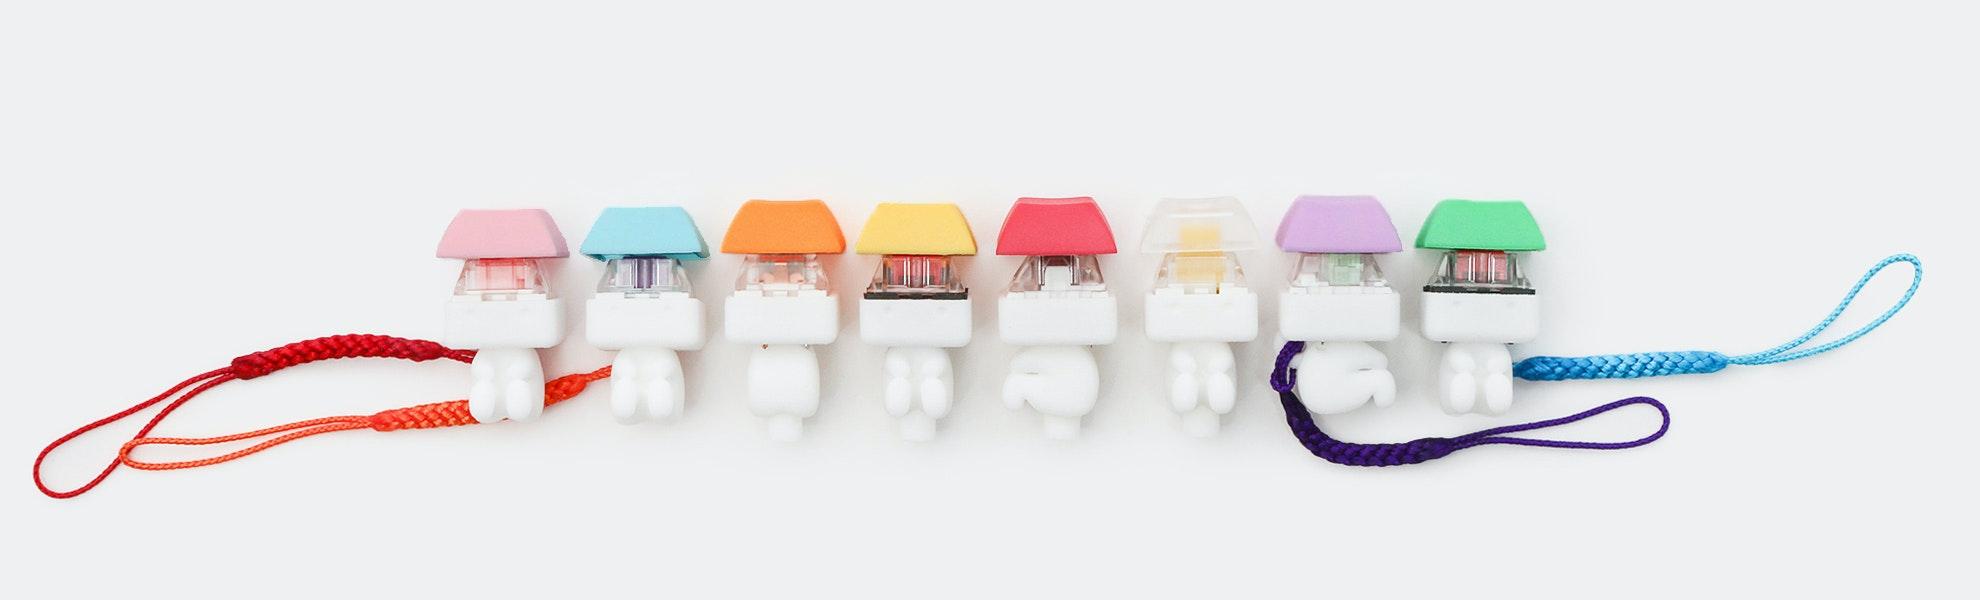 Romly Keycappie Novelty Keycaps/Keychains (2-Pack)